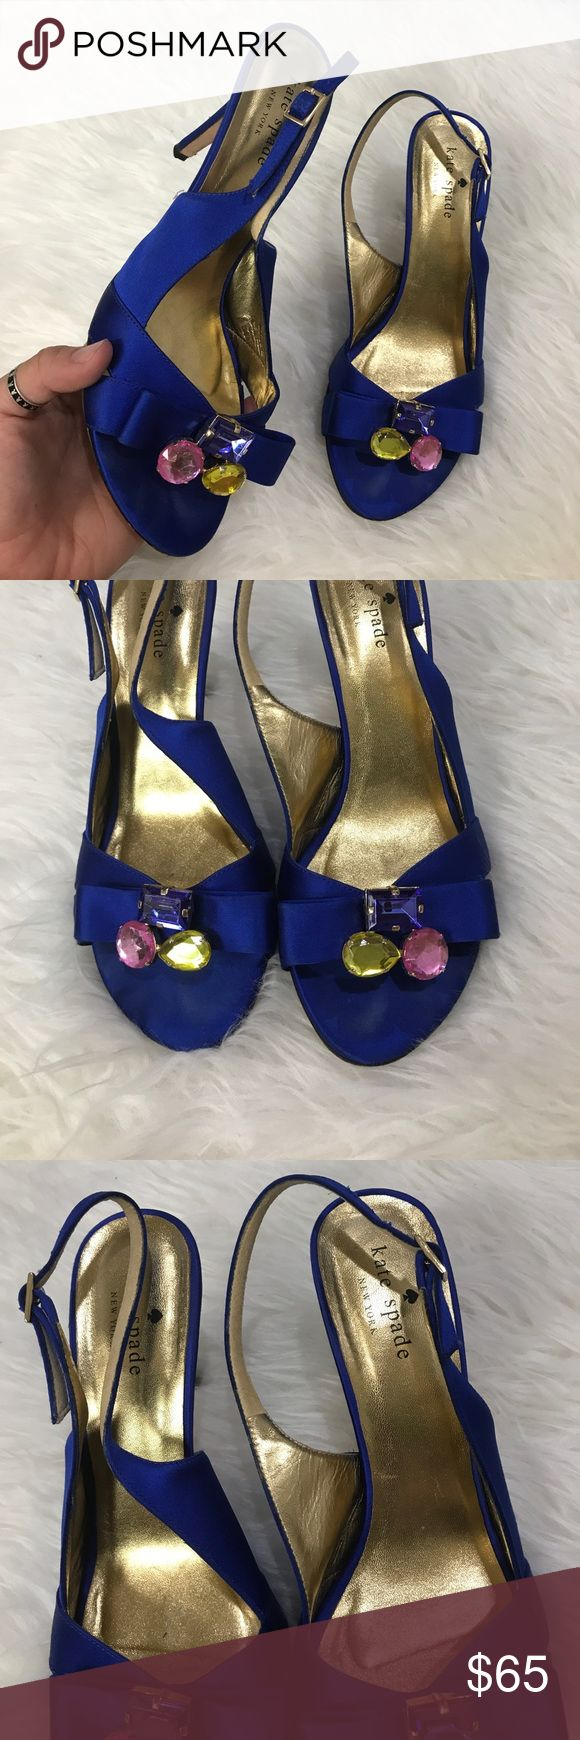 KATE SPADE SZ 7 COBALT BLUE HERLS SHOES CUTE PUMPS Awesome Kate spade pumps kate spade Shoes